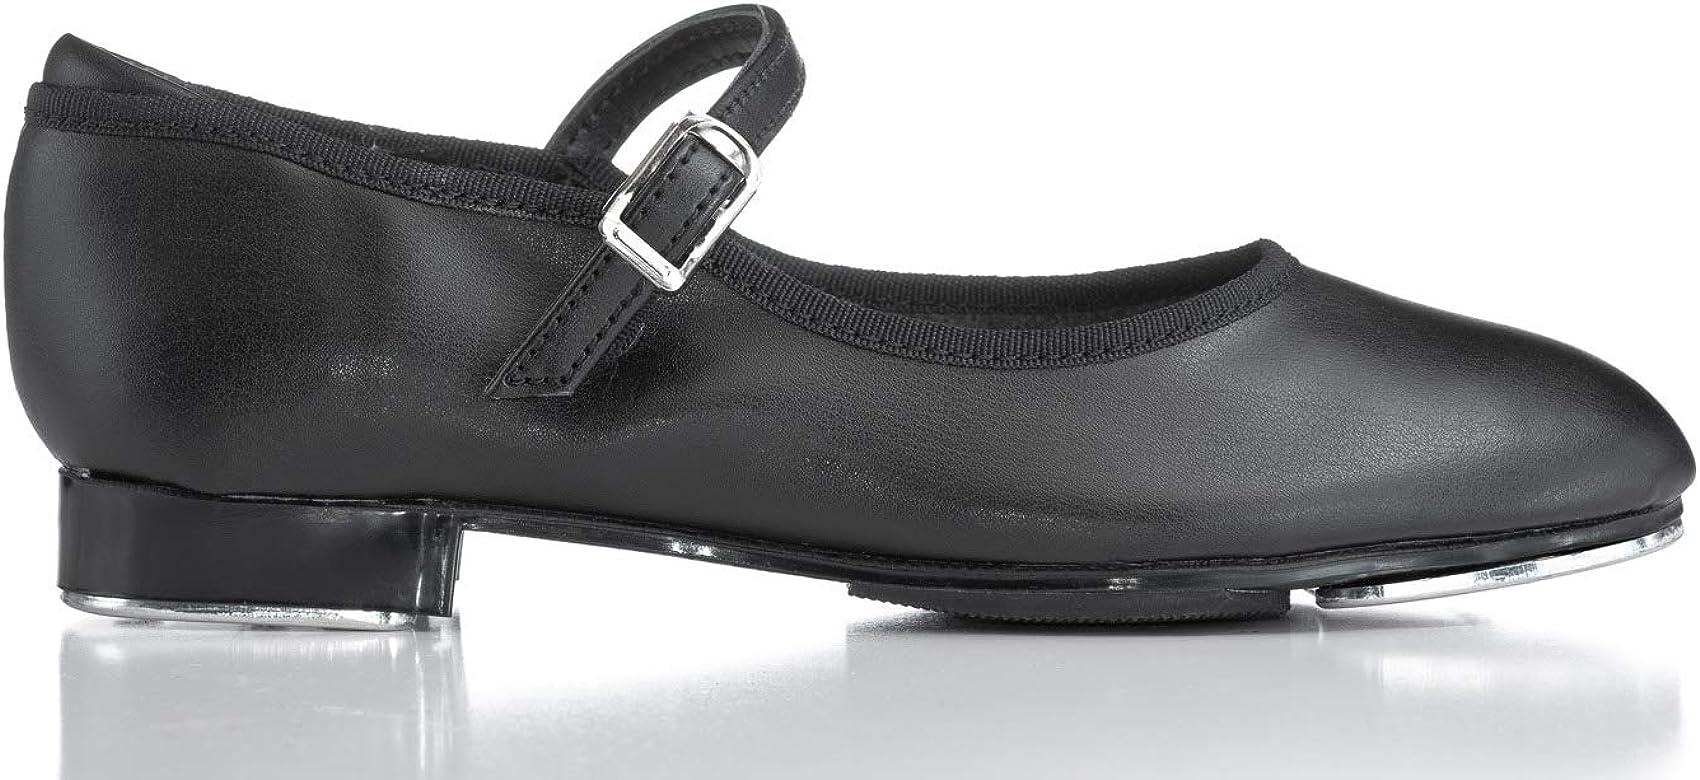 Buckle My Shoe Girls Patent Black Shoe Sizes 13,1,2,3,4,5